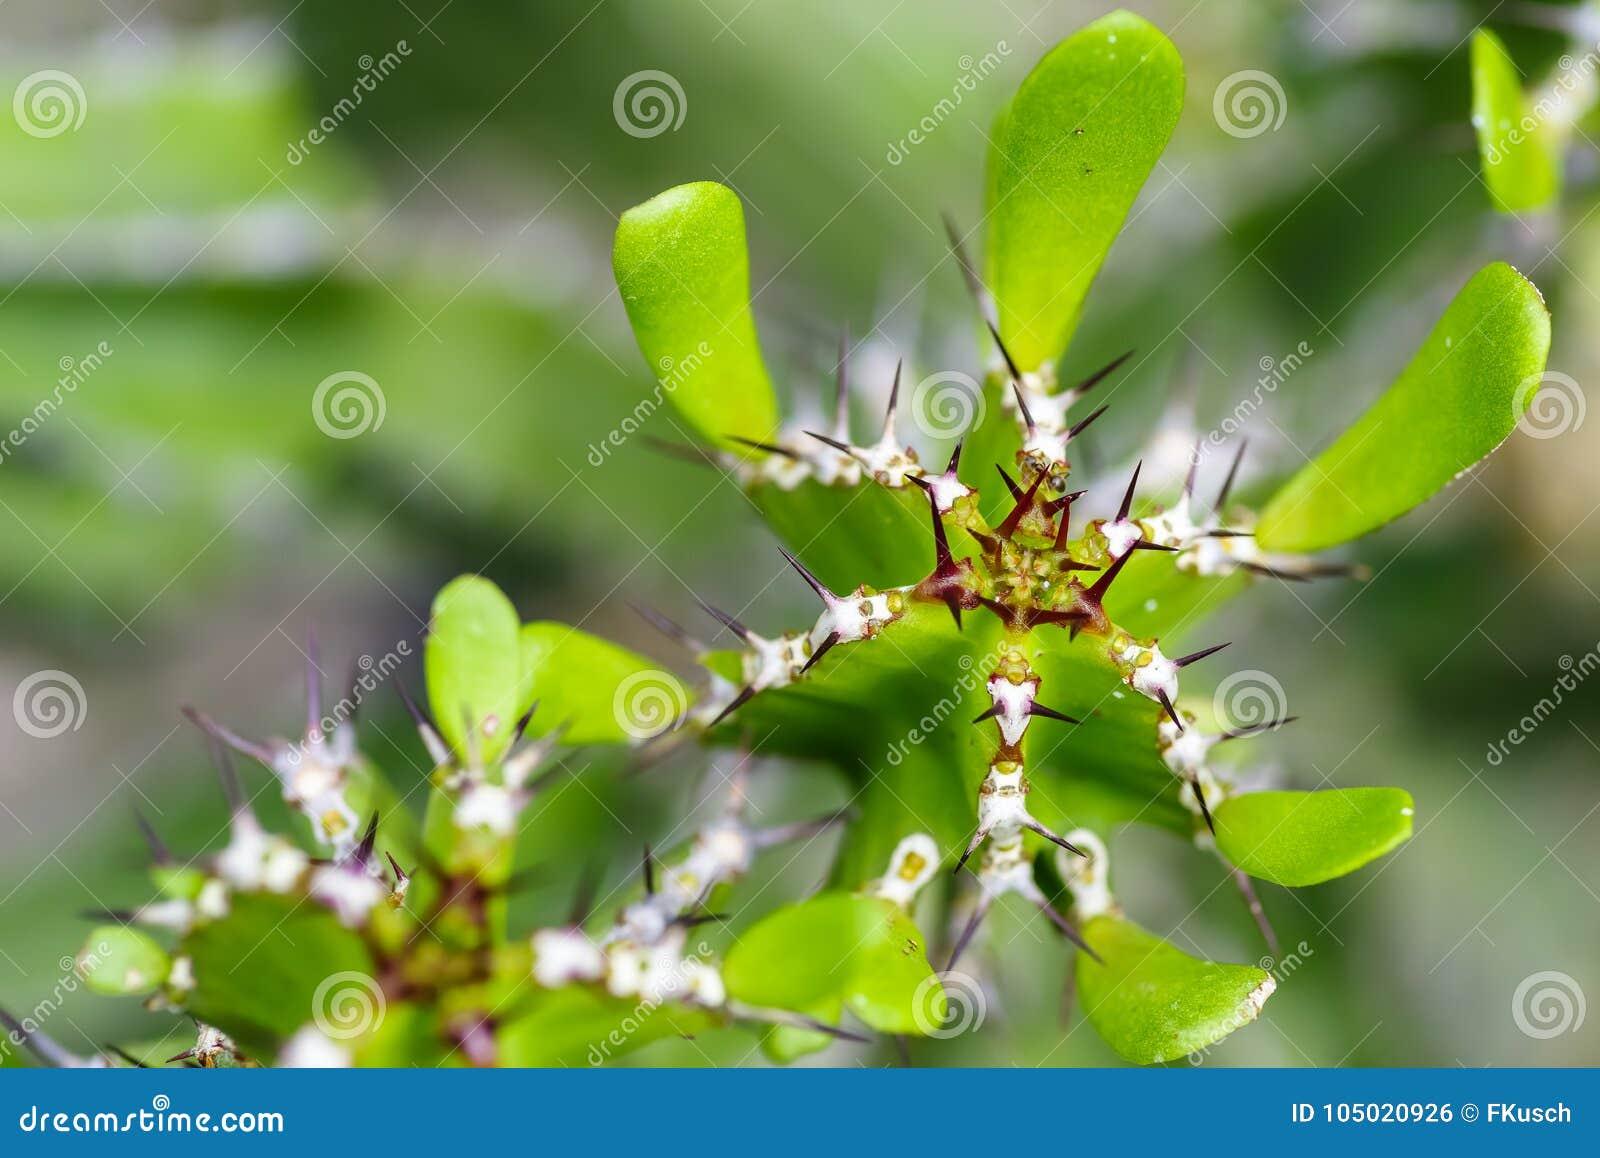 Makro- kandelabru kaktus, euforbii lactea, selekcyjna ostrość